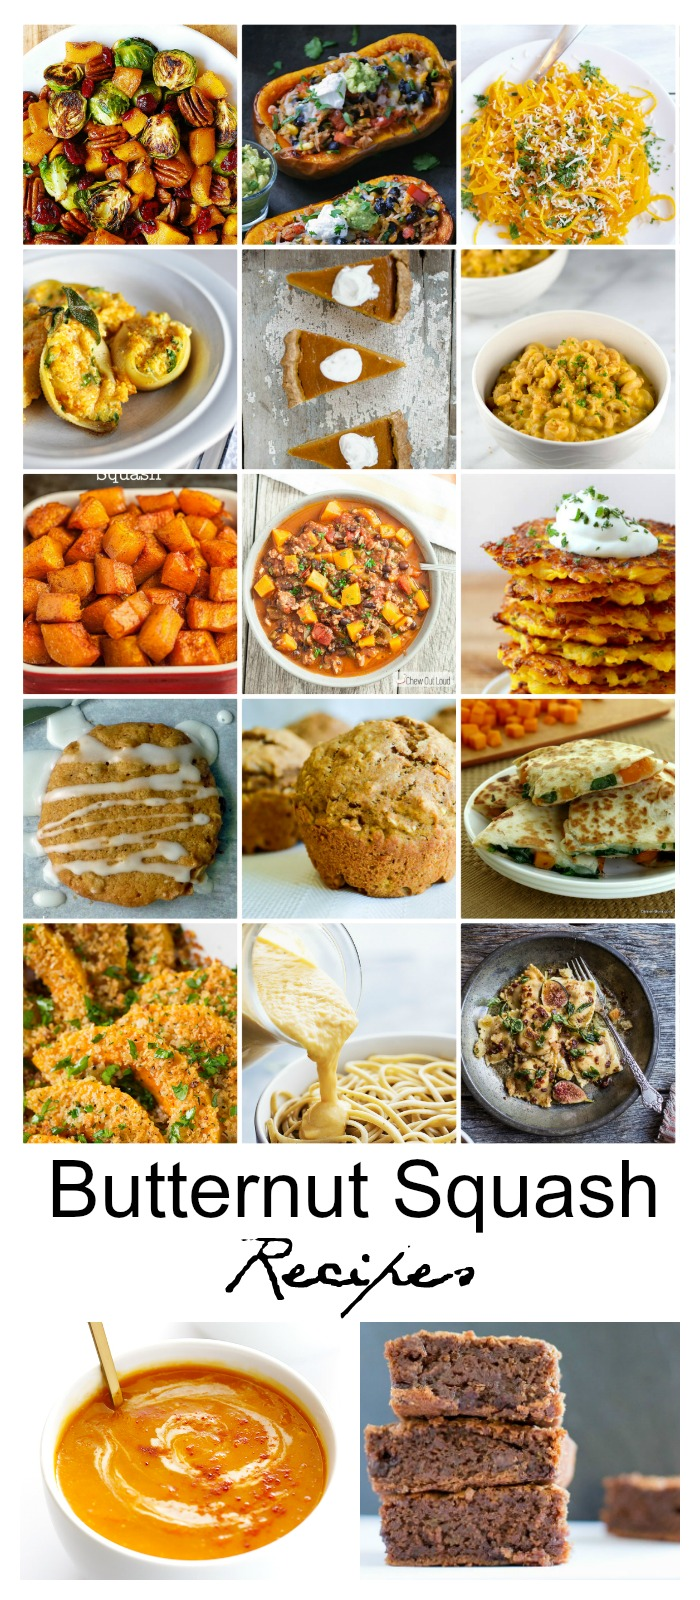 Butternut-Squash-Recipes-Ideas-Pin